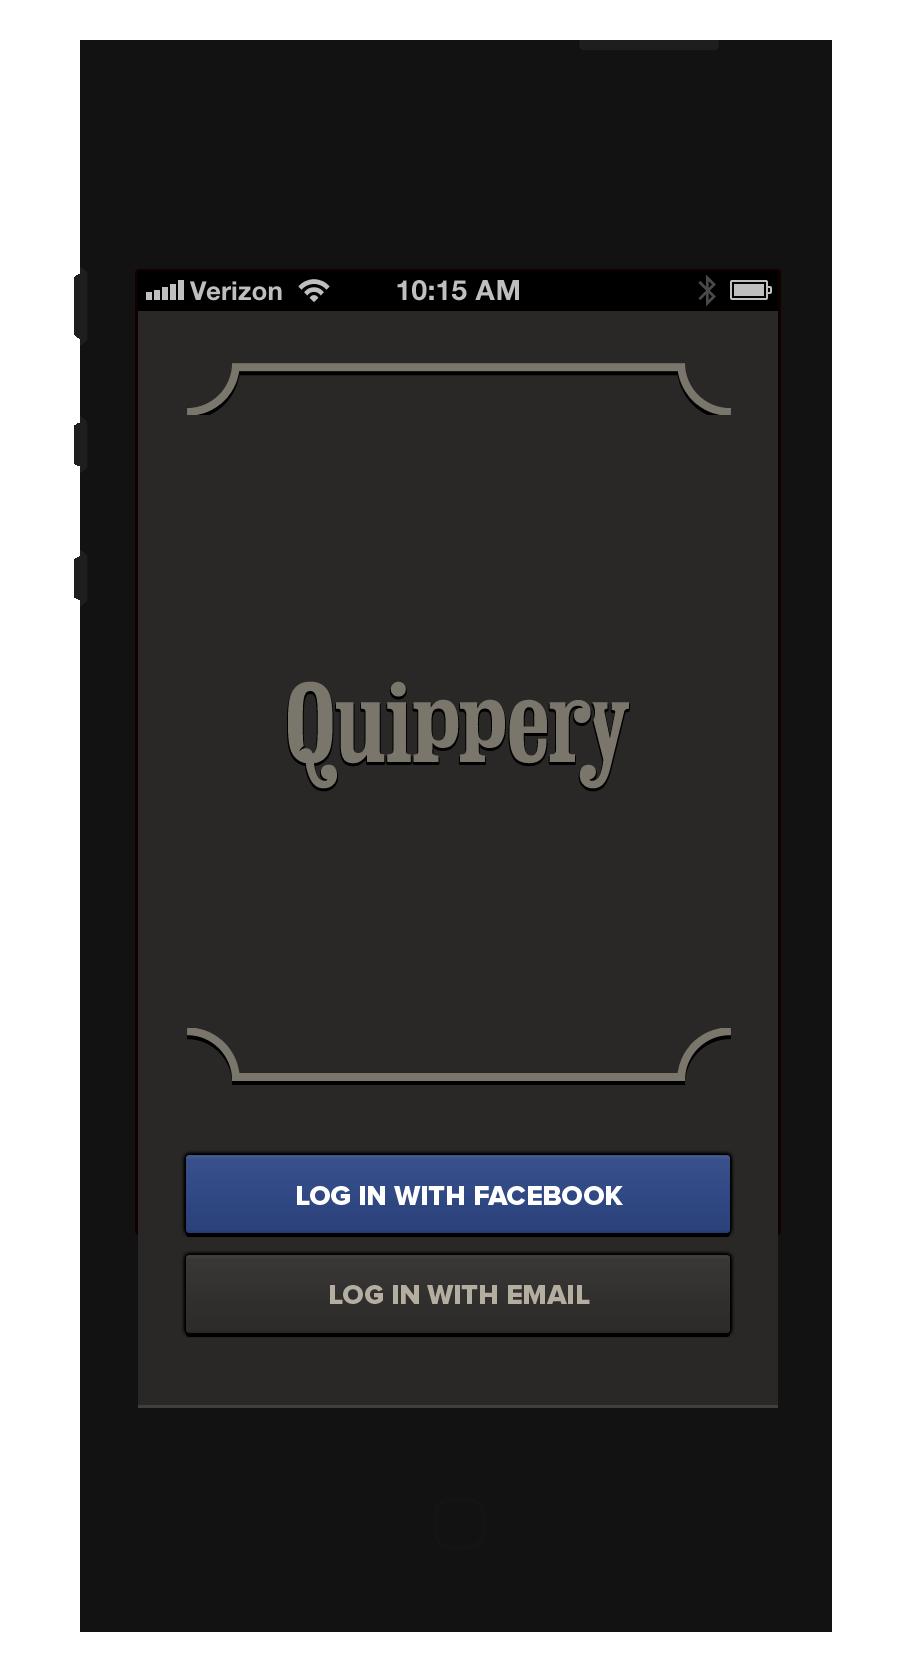 quippery_in-phone_login.png